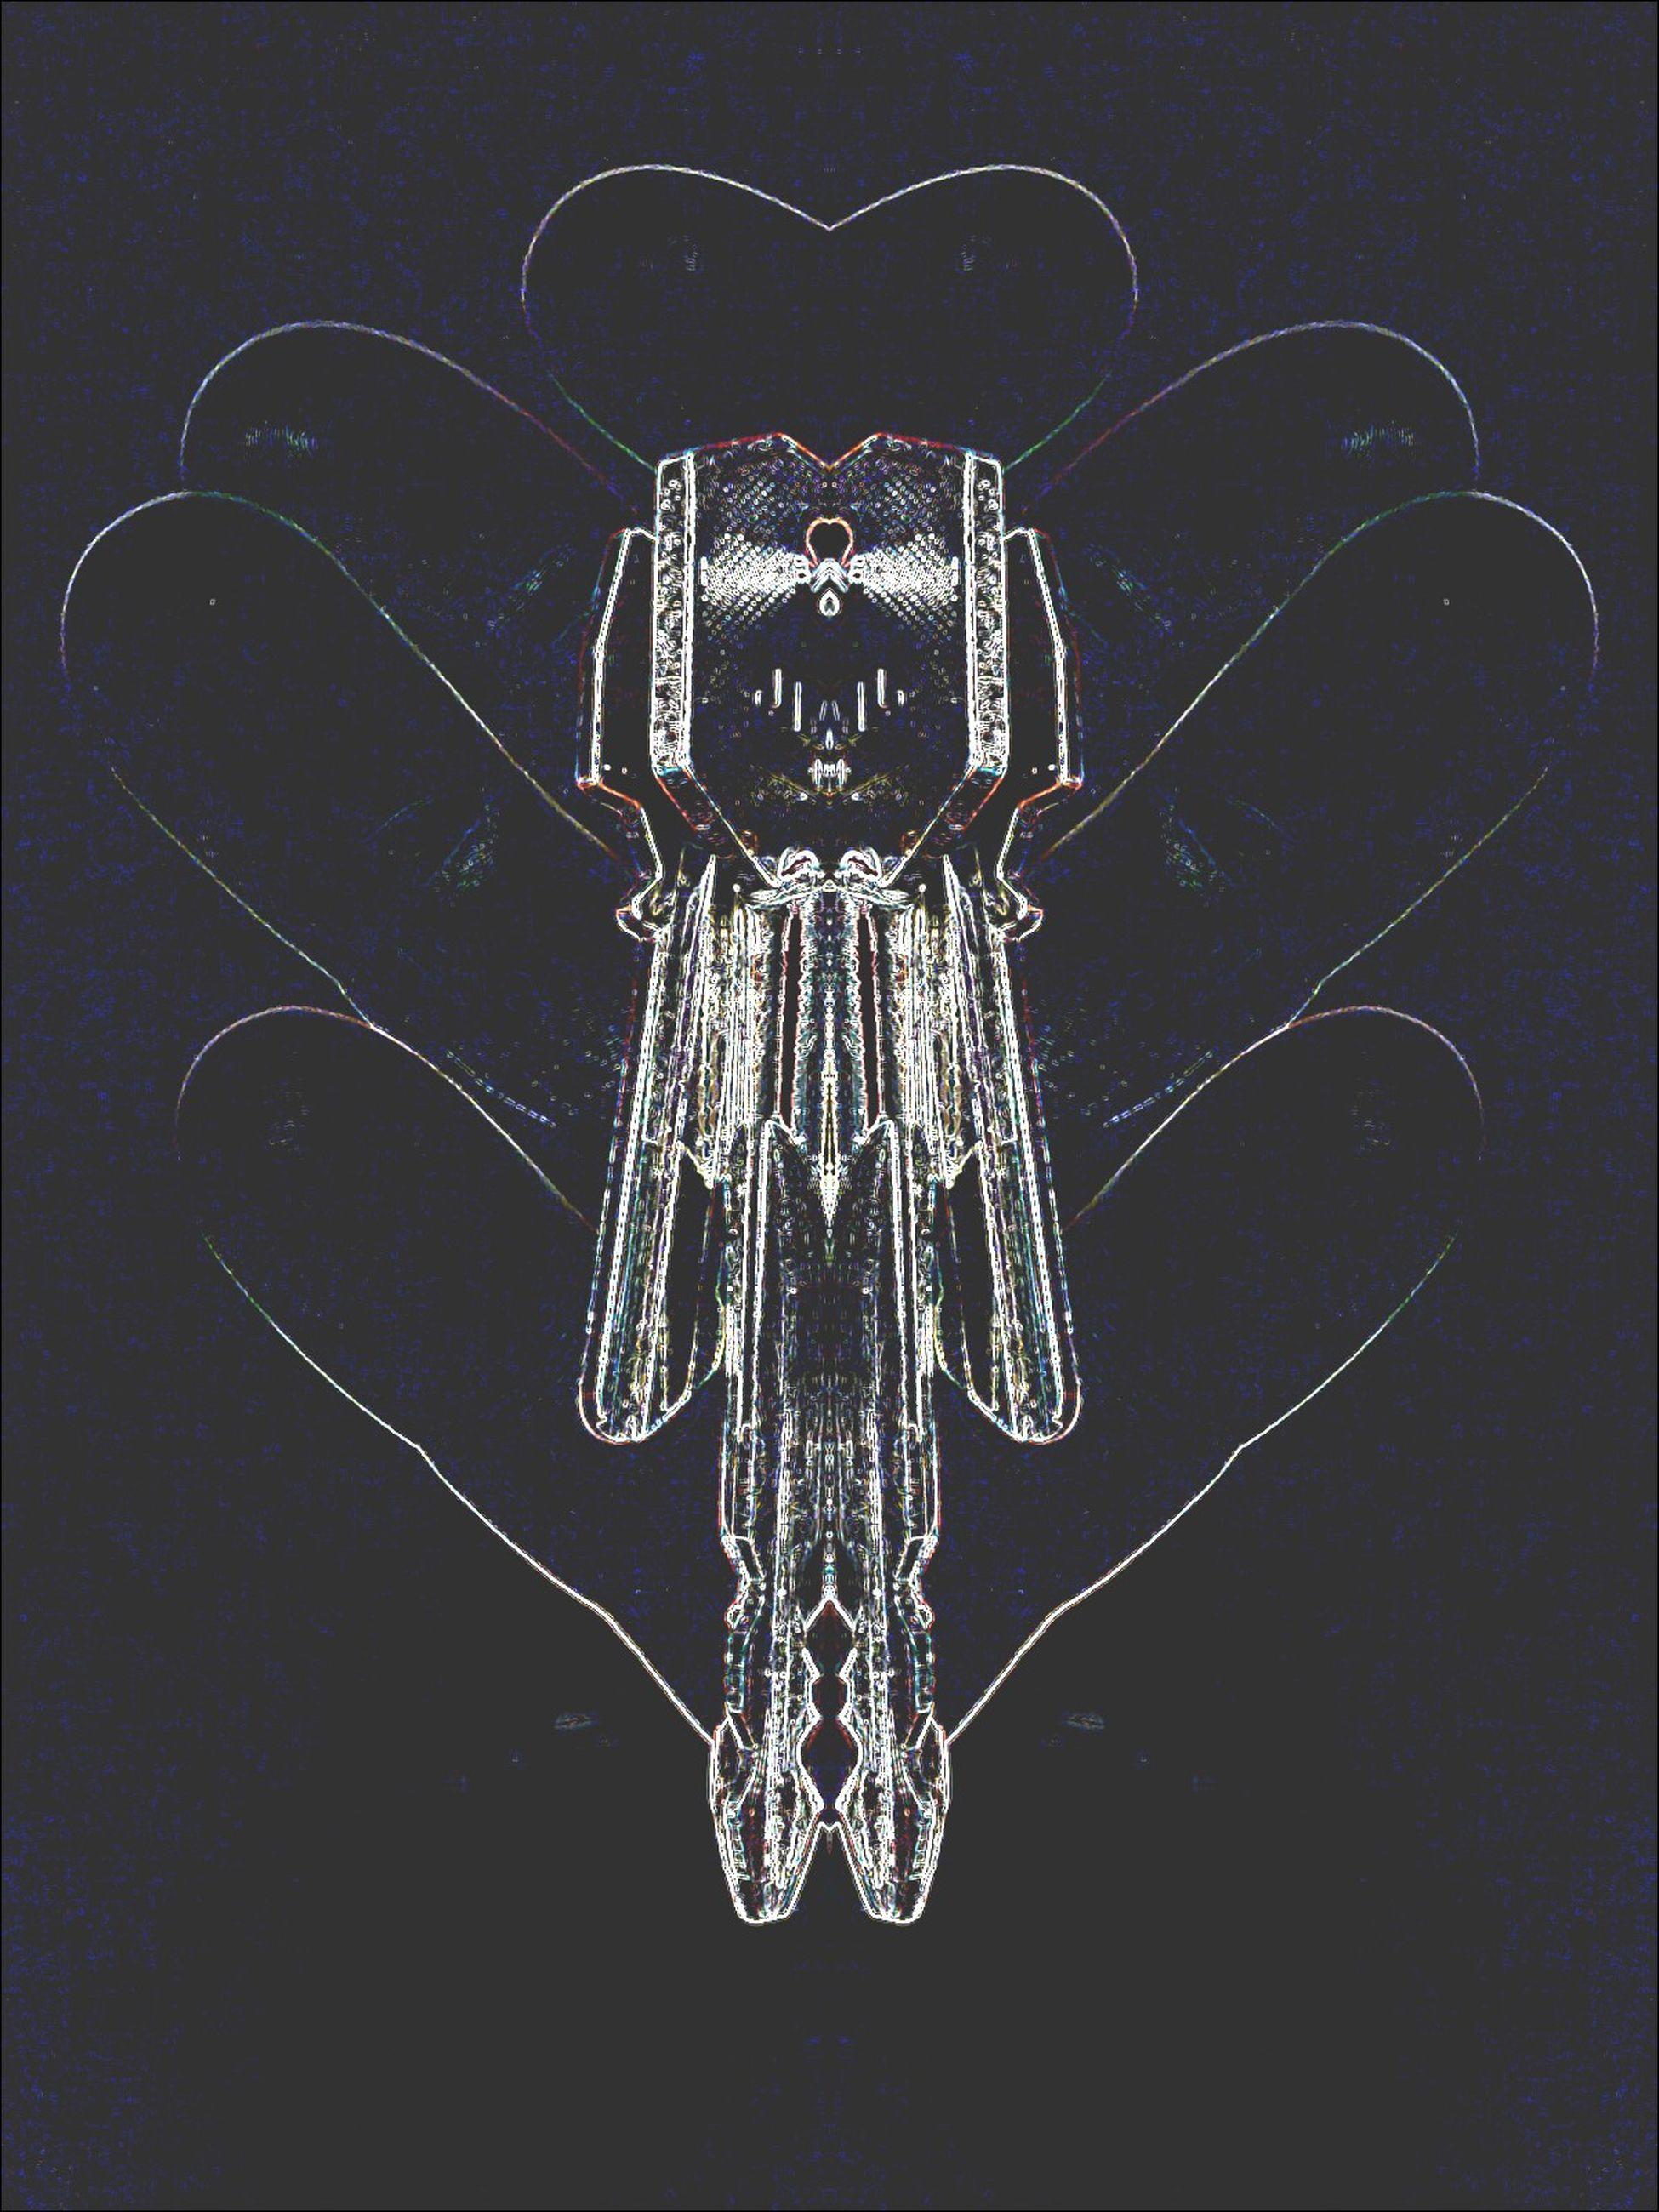 indoors, studio shot, hanging, close-up, black background, metal, still life, electricity, no people, shiny, decoration, lighting equipment, ideas, complexity, pattern, design, metallic, creativity, illuminated, technology